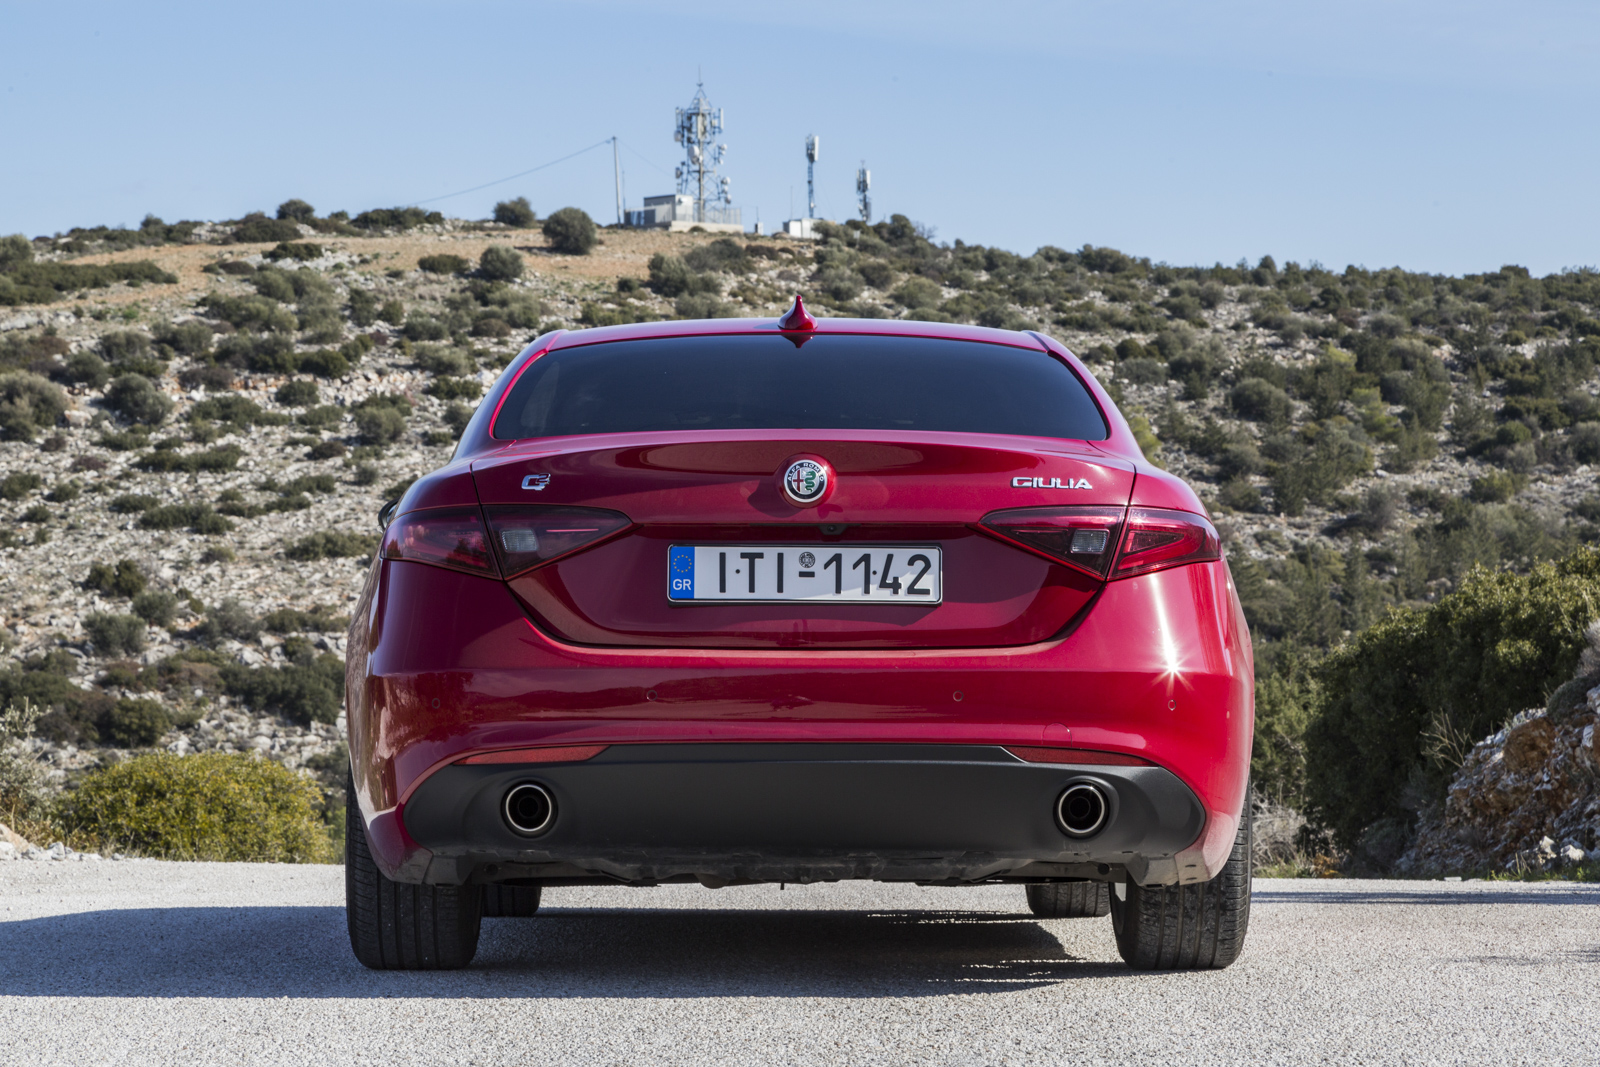 Test_Drive_Alfa_Romeo_Giulia_Diesel_09